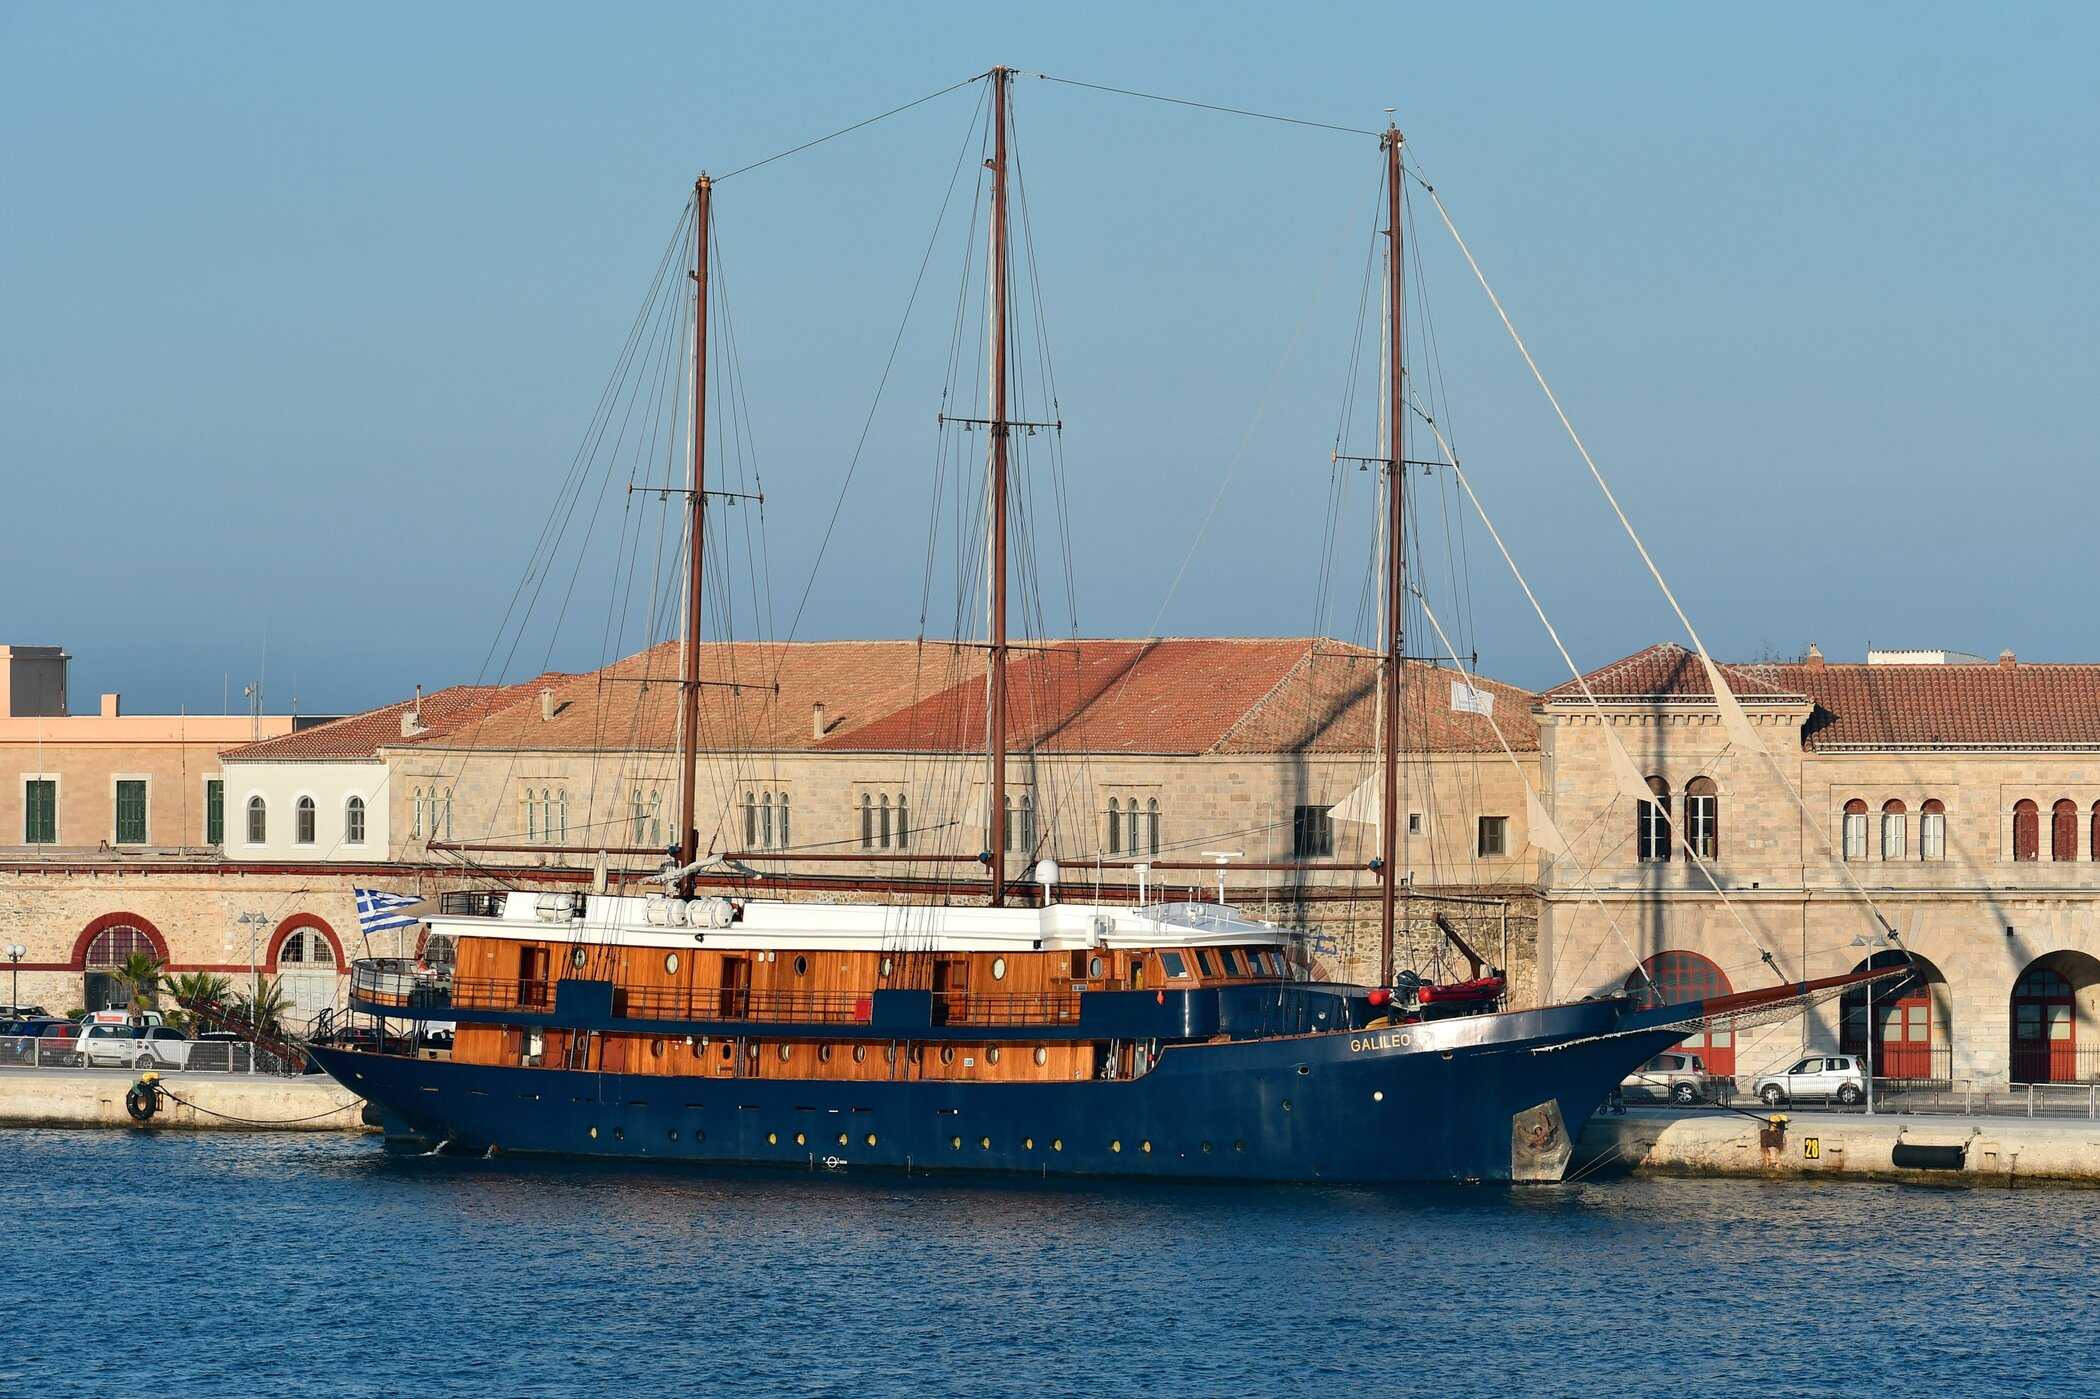 Galileo_01-09-21_Syros